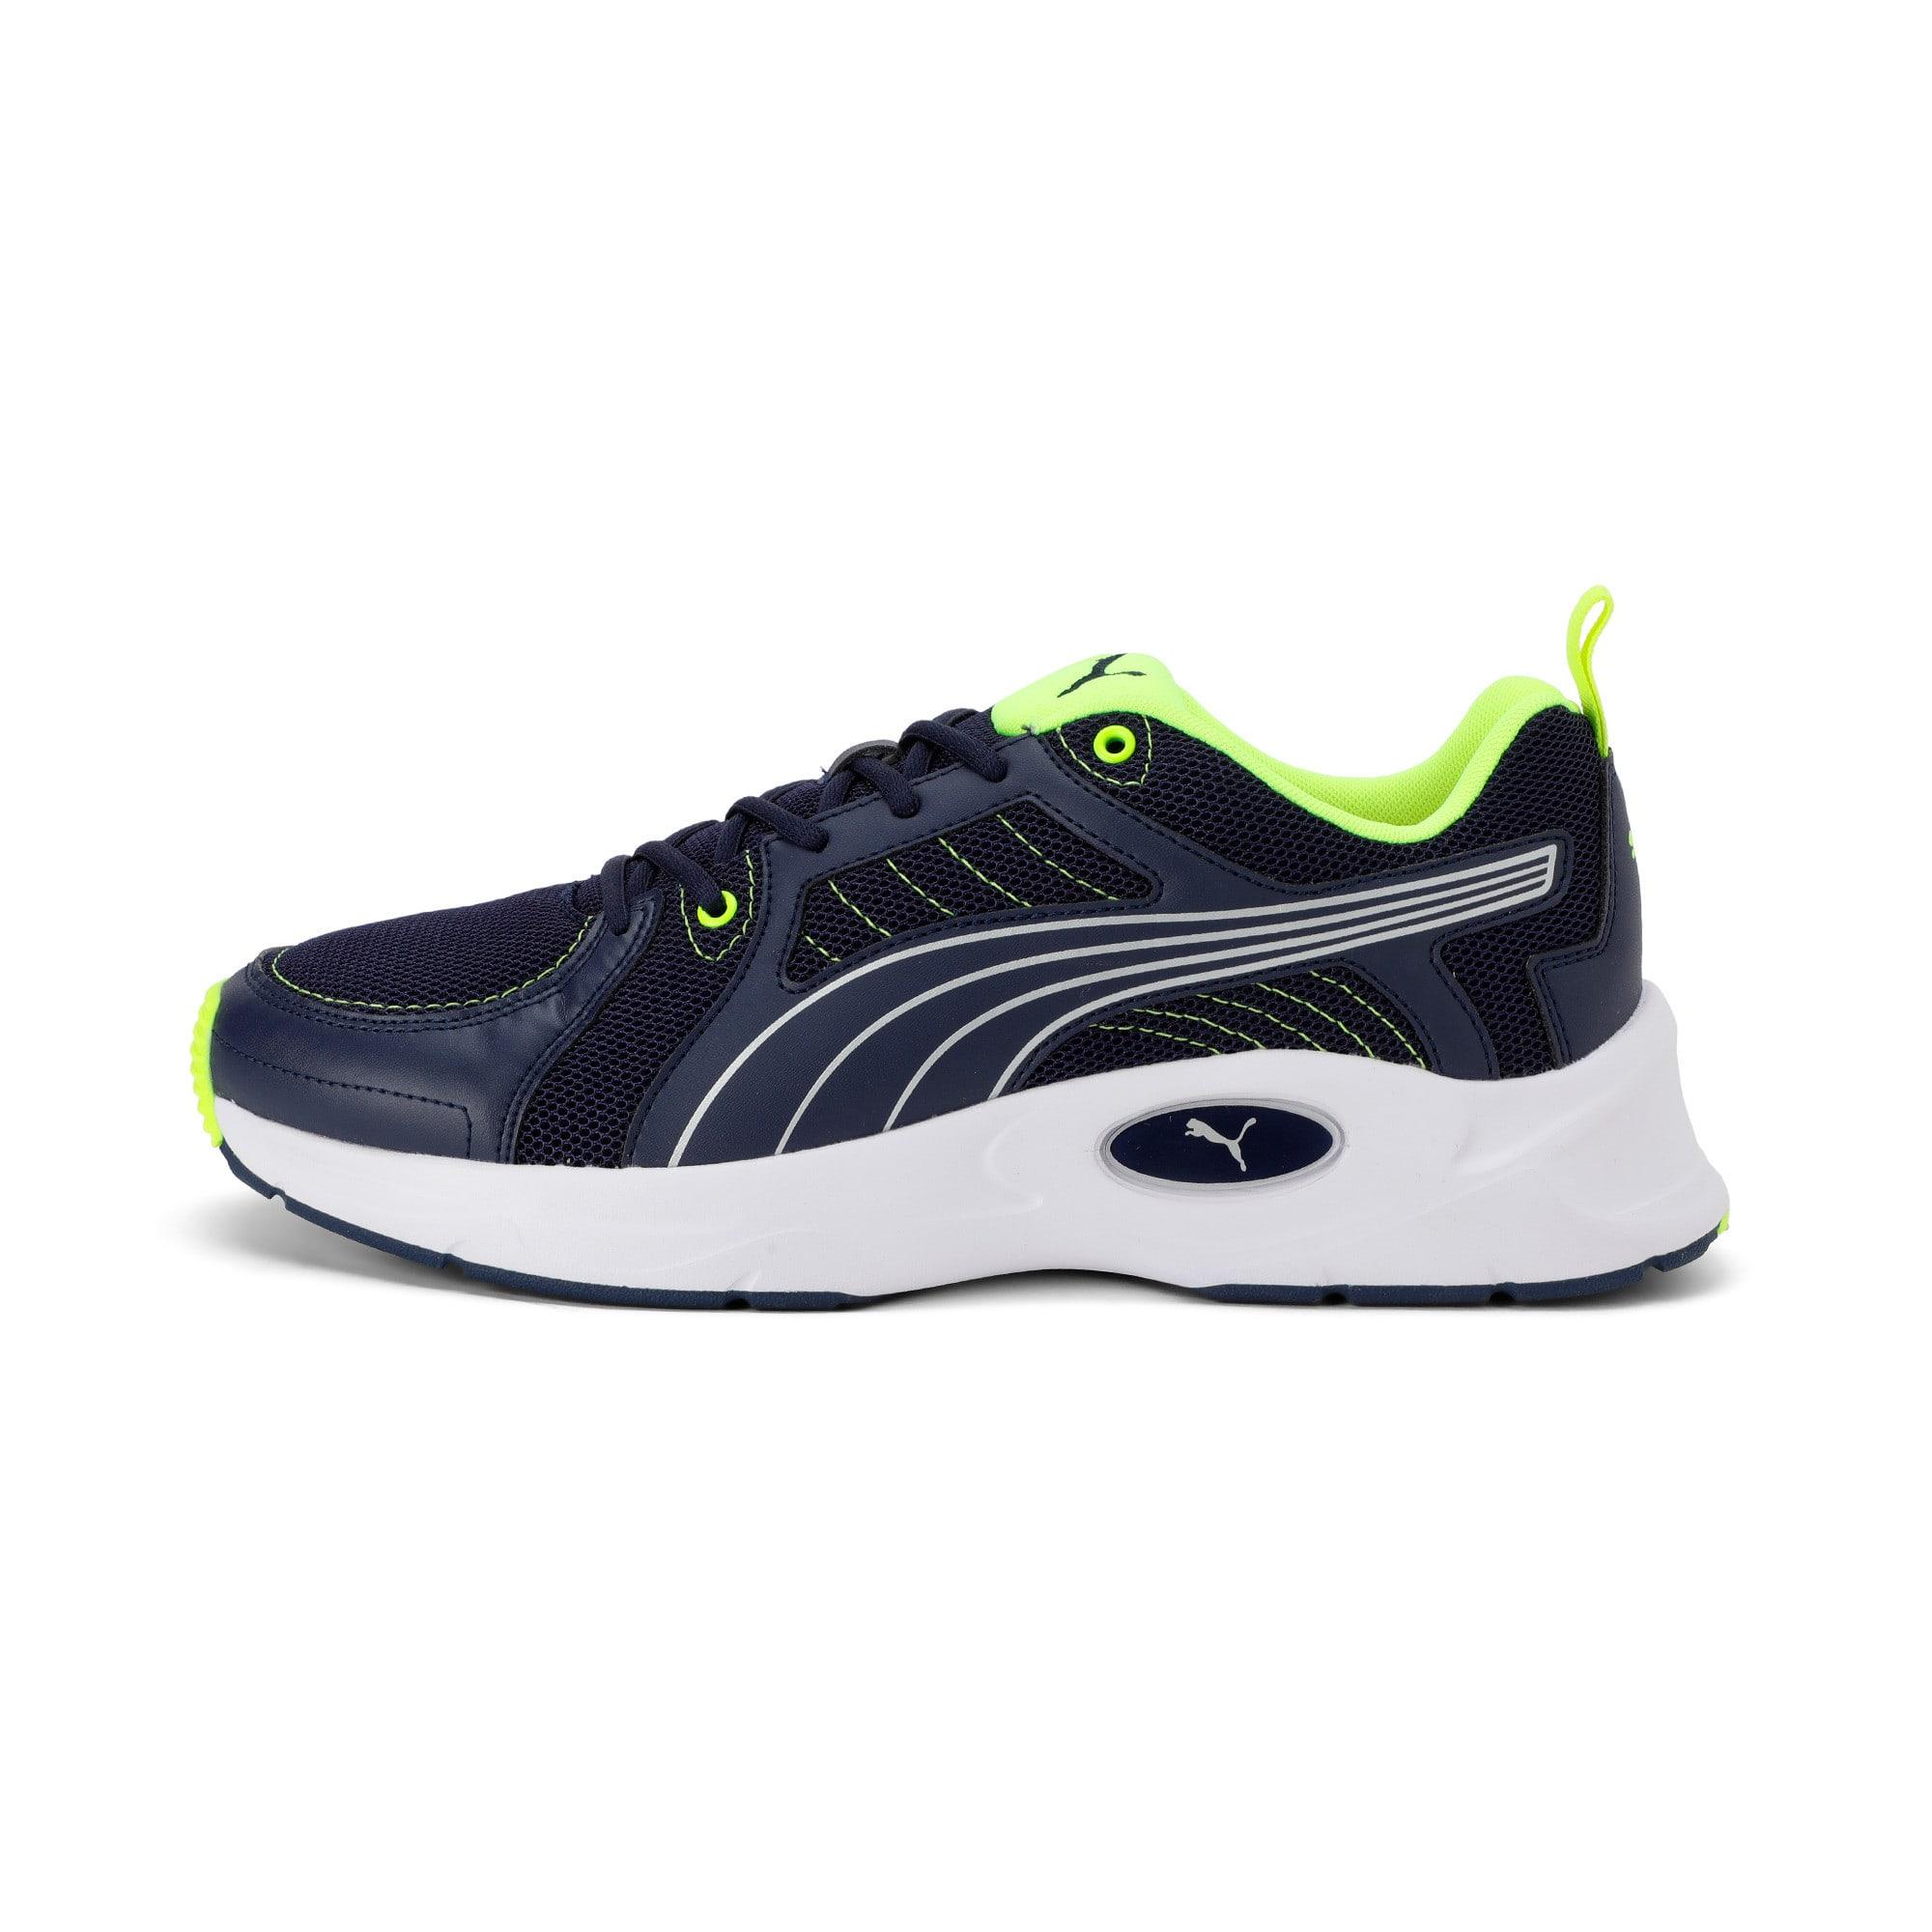 Thumbnail 1 of Nucleus Run Training Shoes, Peacoat-Puma Silver, medium-IND